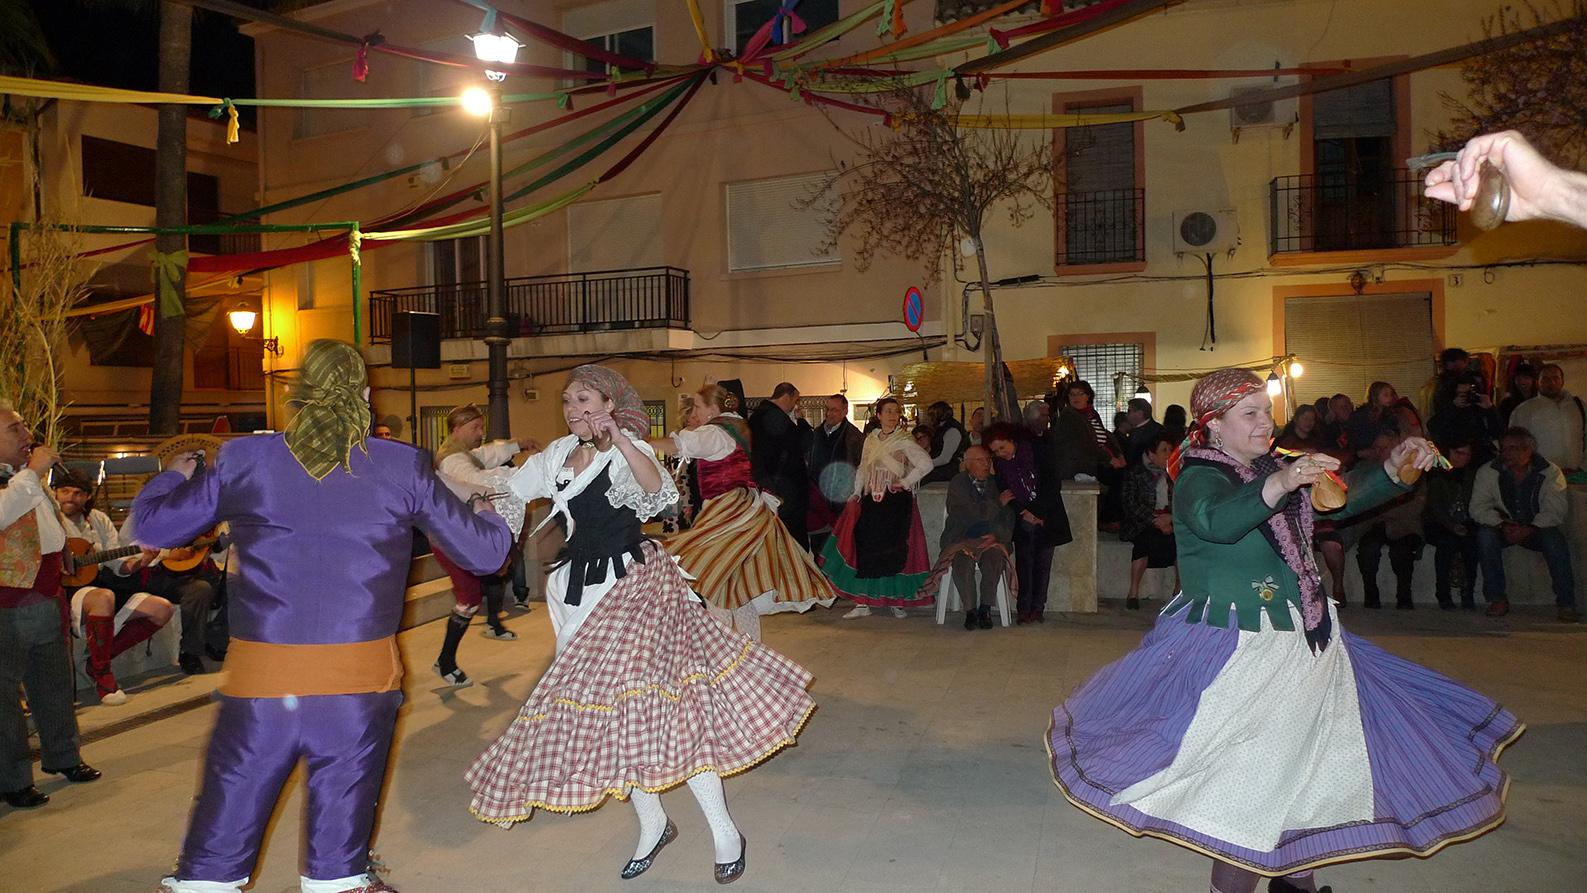 2014-02-23 - Baladre a Fira St. Marcia-ROTOVA (217)